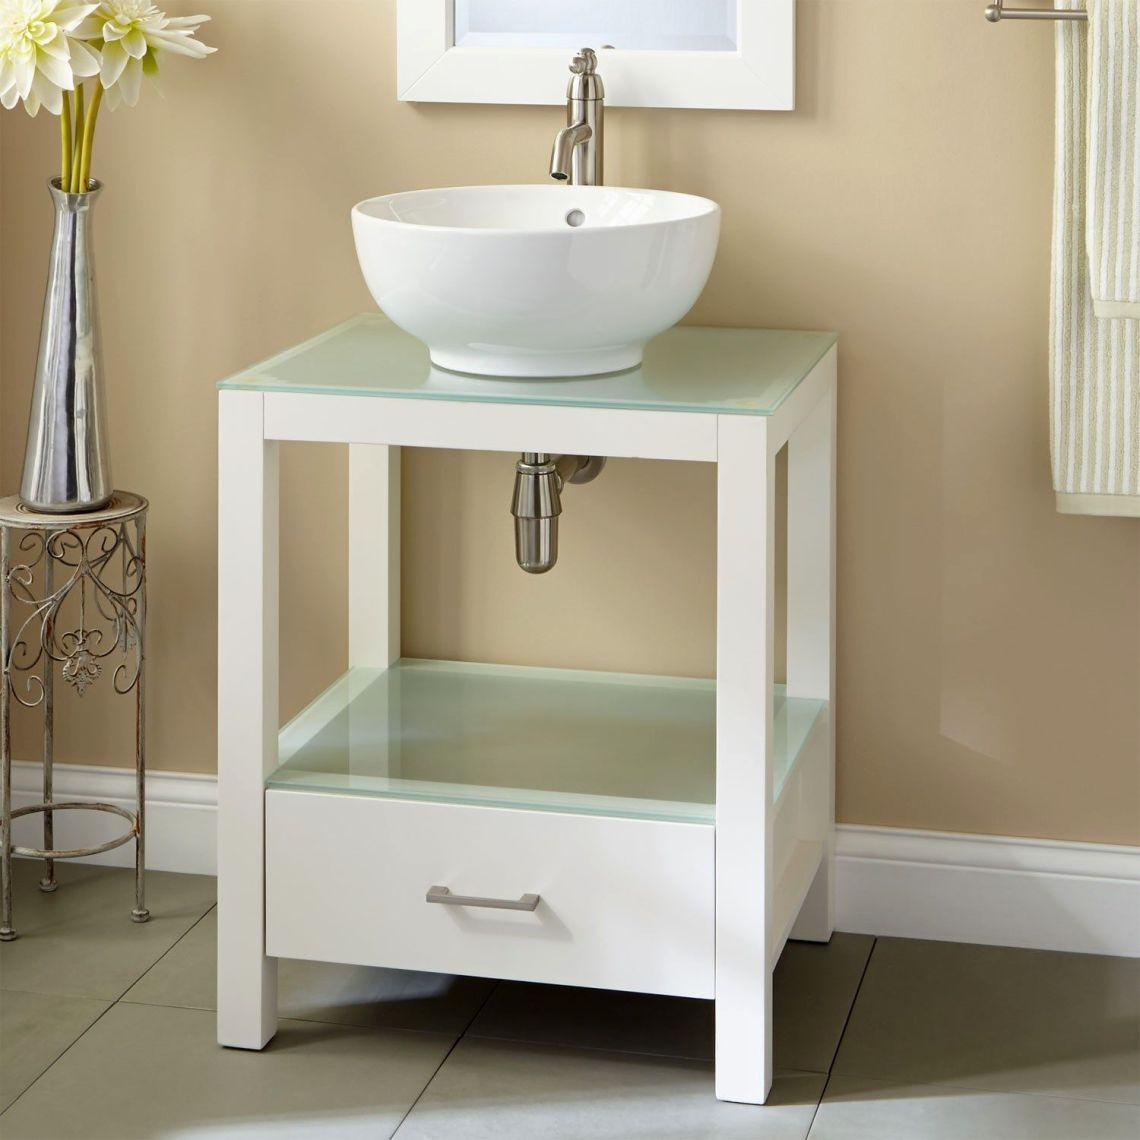 Cute Cheap Vanity Bathroom Architecture - Home Sweet Home ...